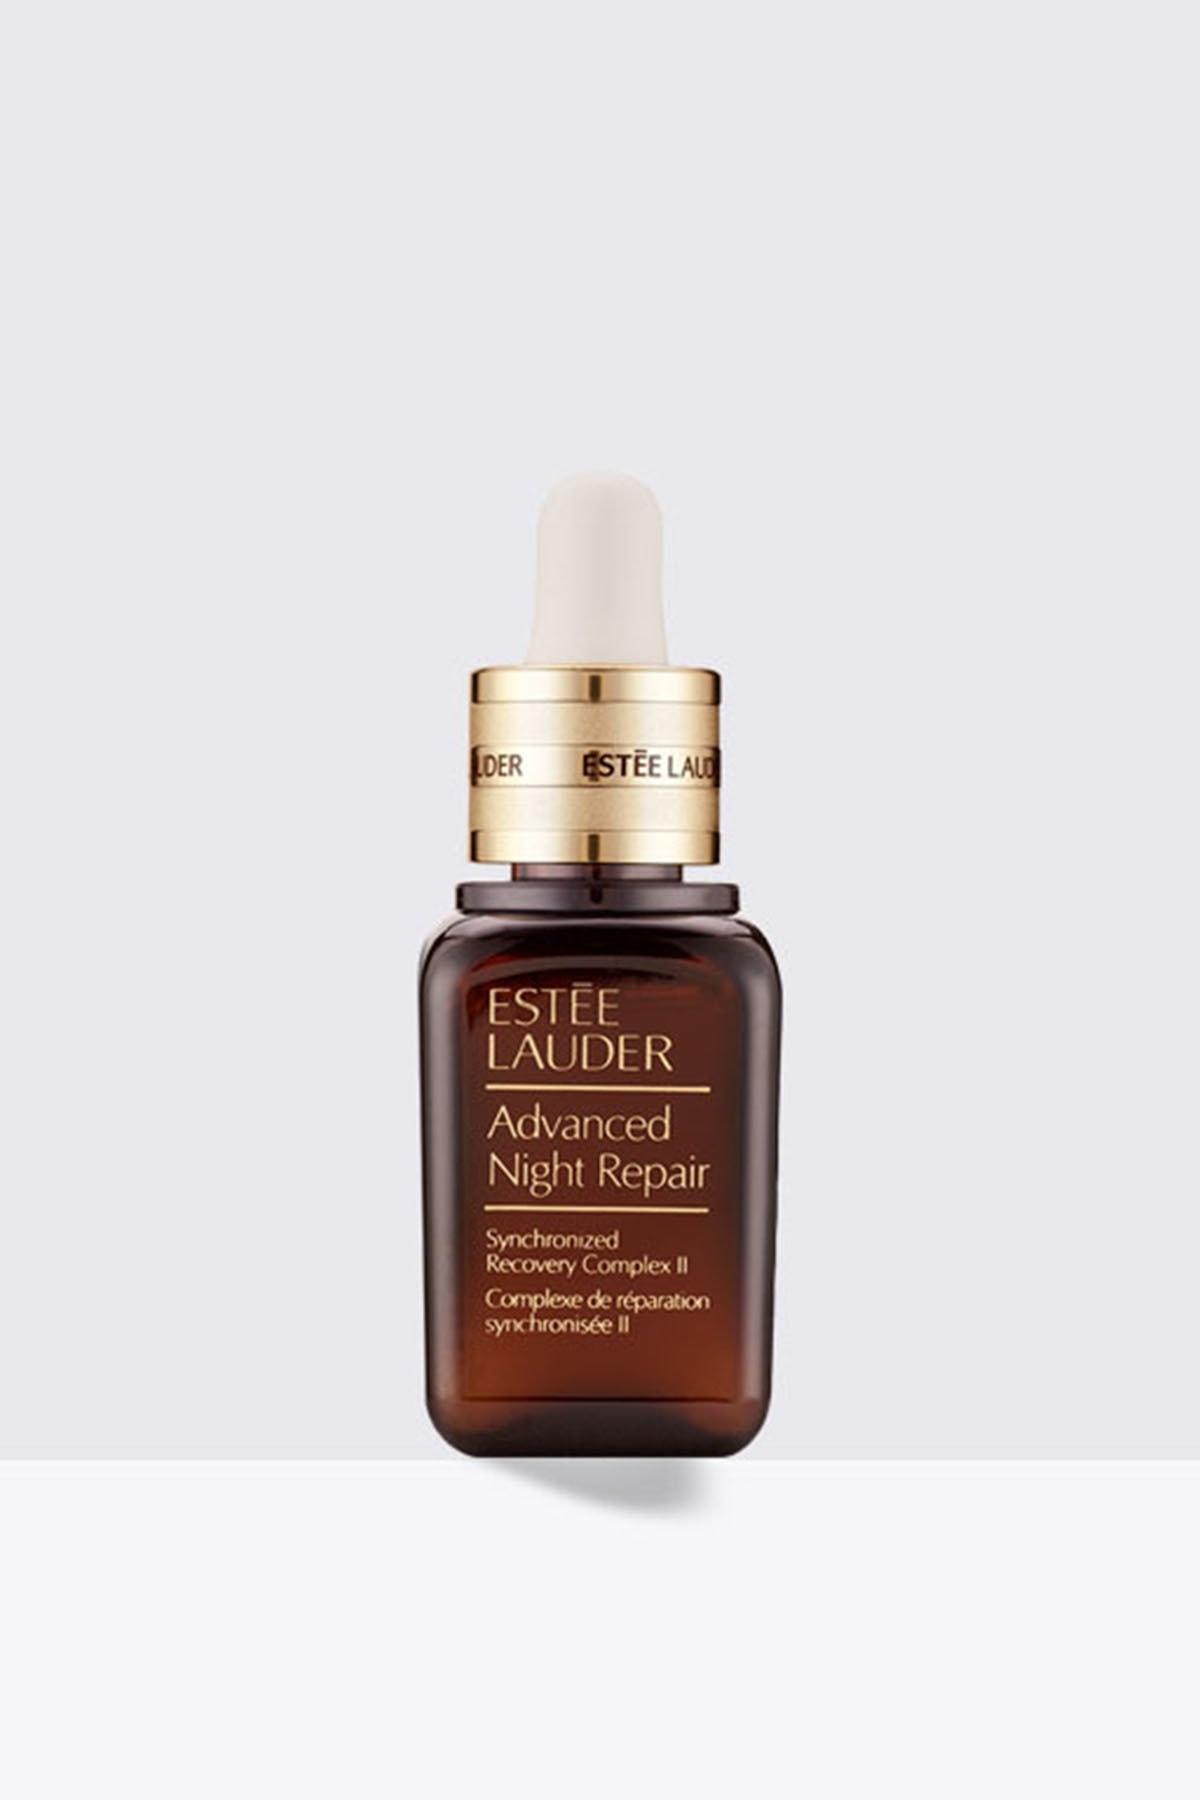 Estee Lauder Yaşlanma Karşıtı Gece Serumu - Advanced Night Repair 20 ml- 50 ml - 75 ml недорого